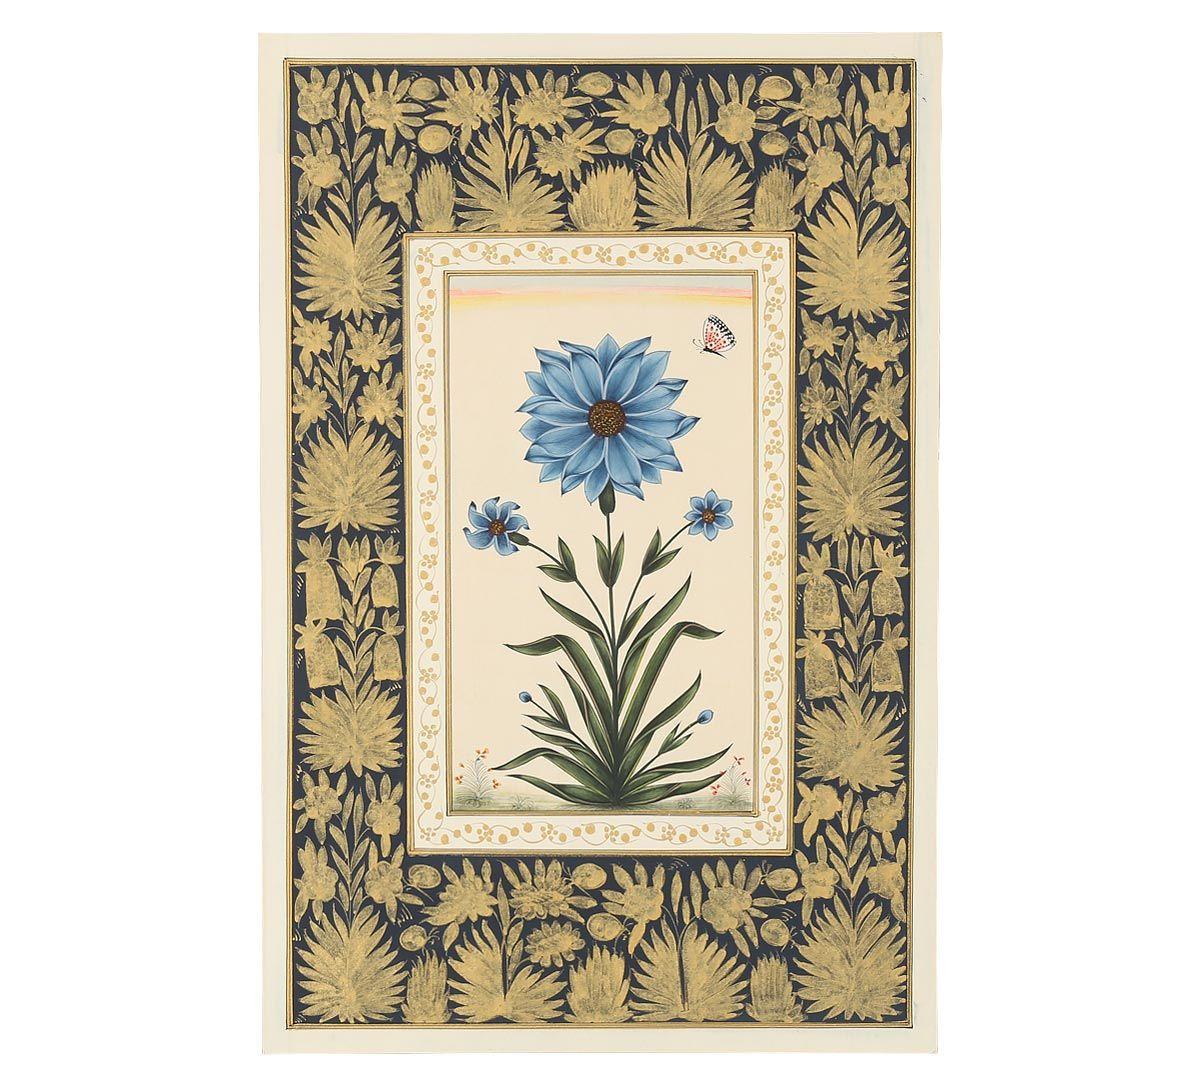 India Circus Mughal Flower Handmade Poster